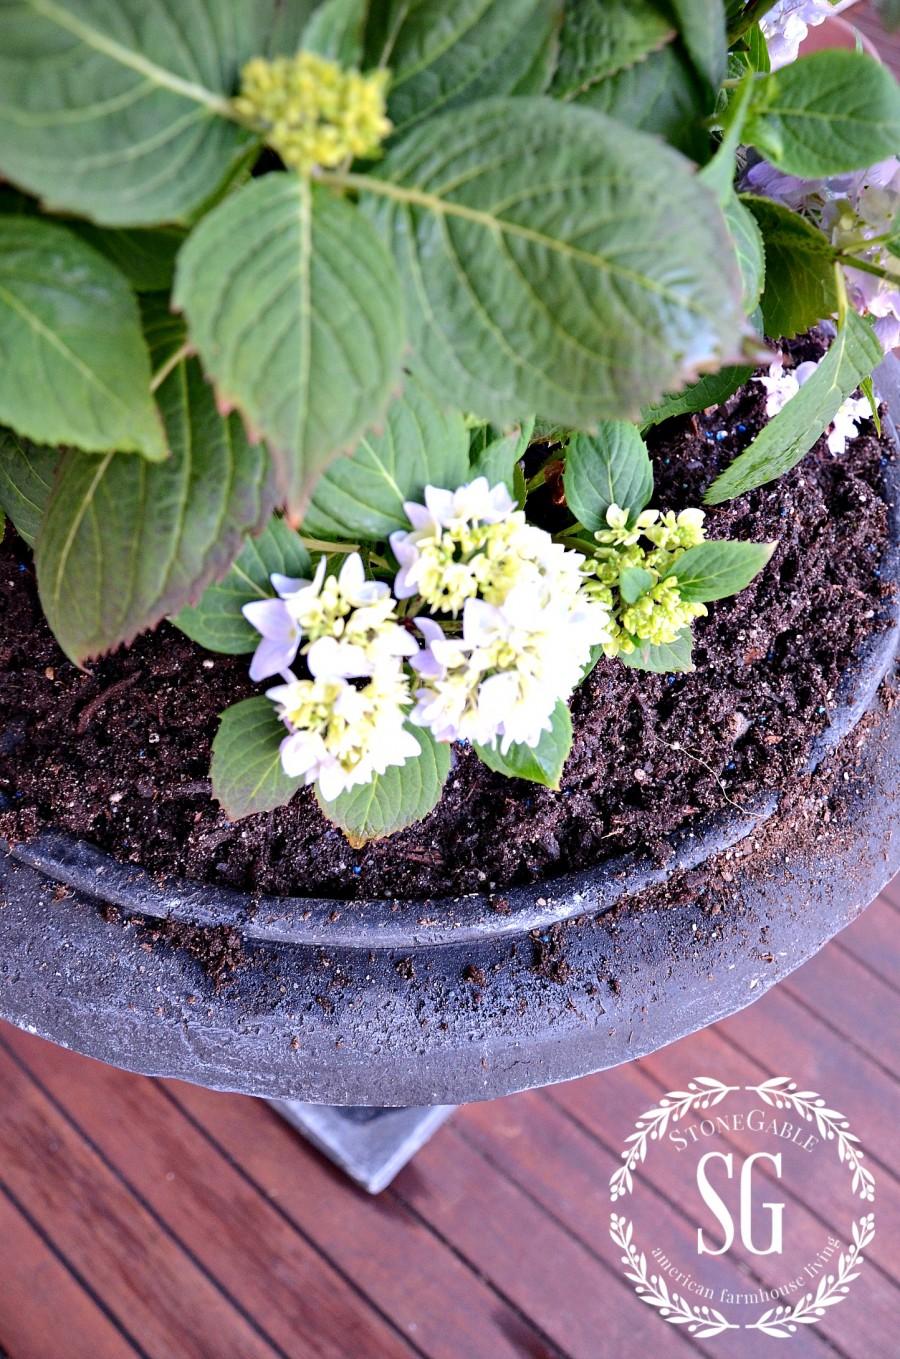 PLANTING HYDRANGEAS IN POT AND URNS-newly planted-hydrangeas-urns-stonegableblog.com